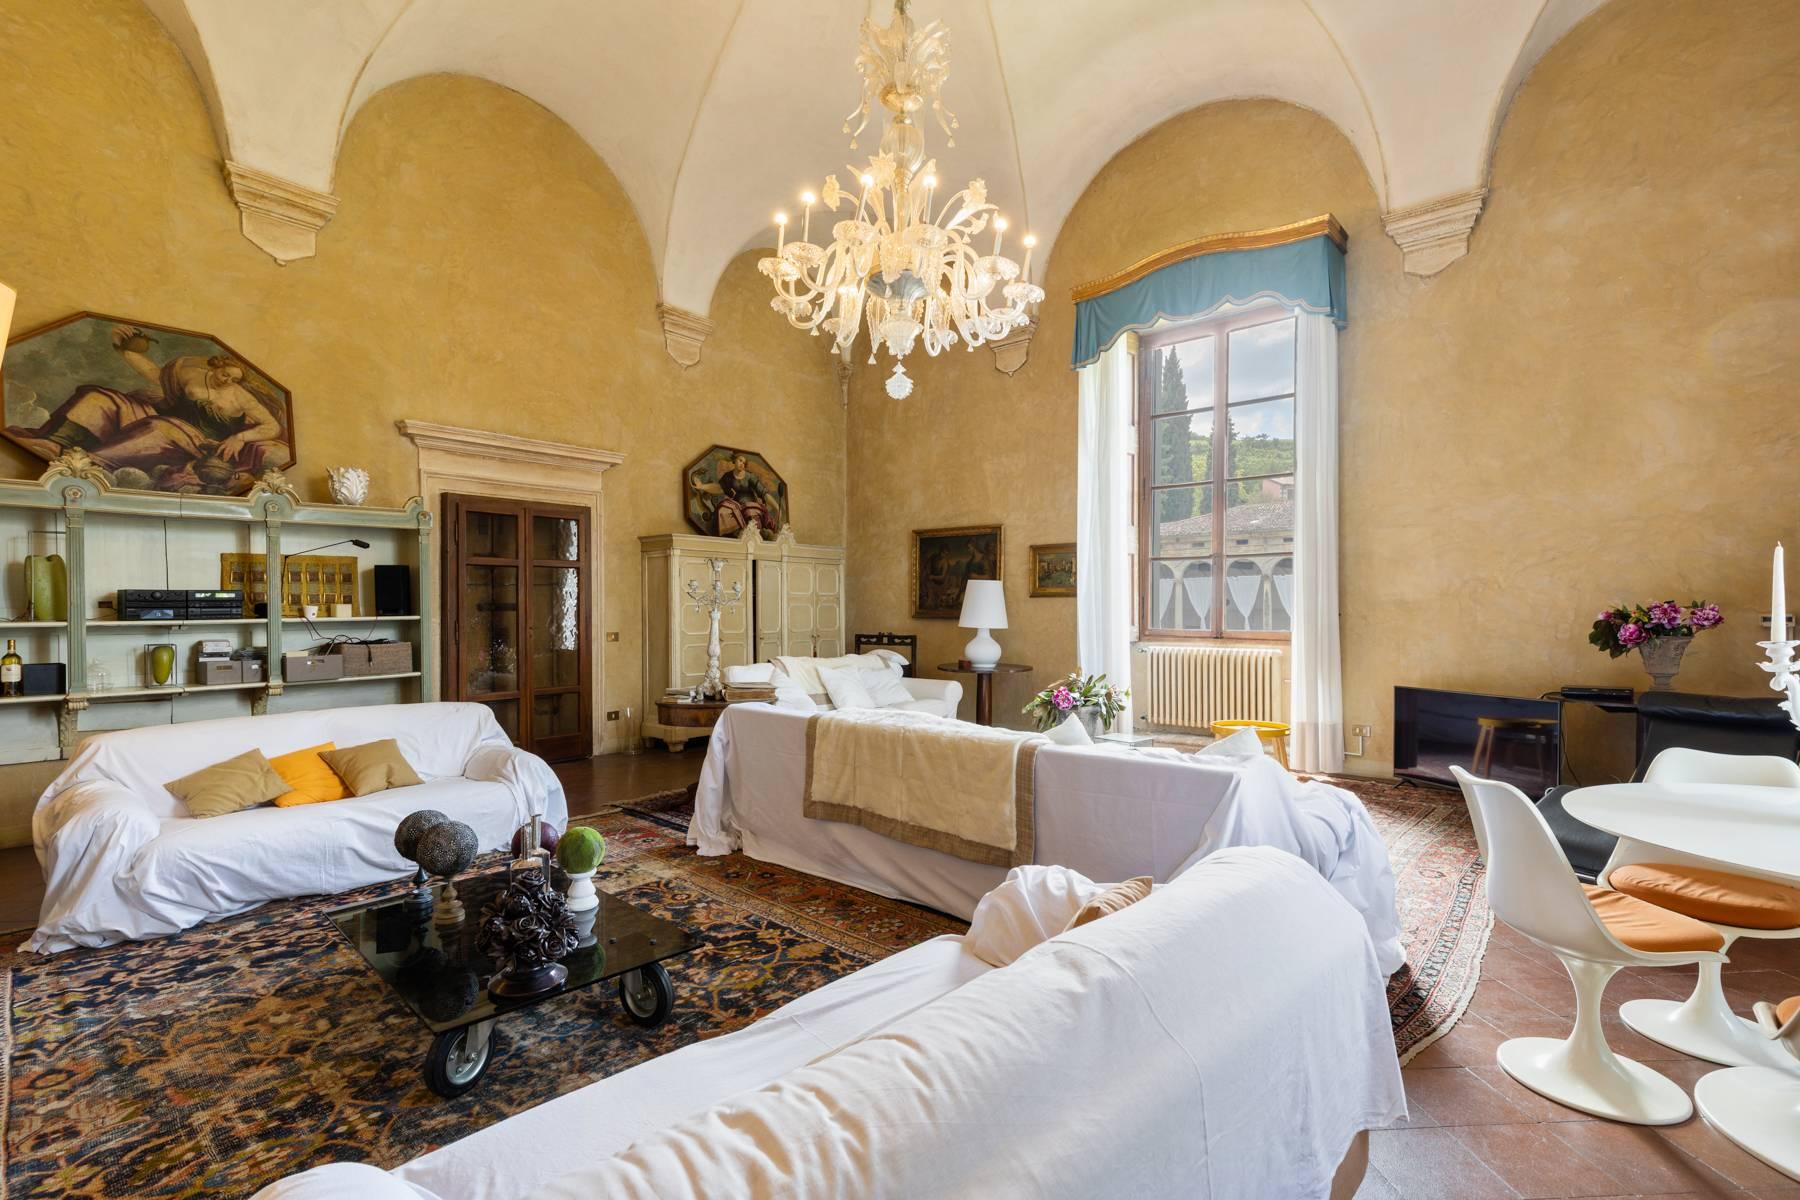 Villa in Vendita a Verona: 5 locali, 2400 mq - Foto 21